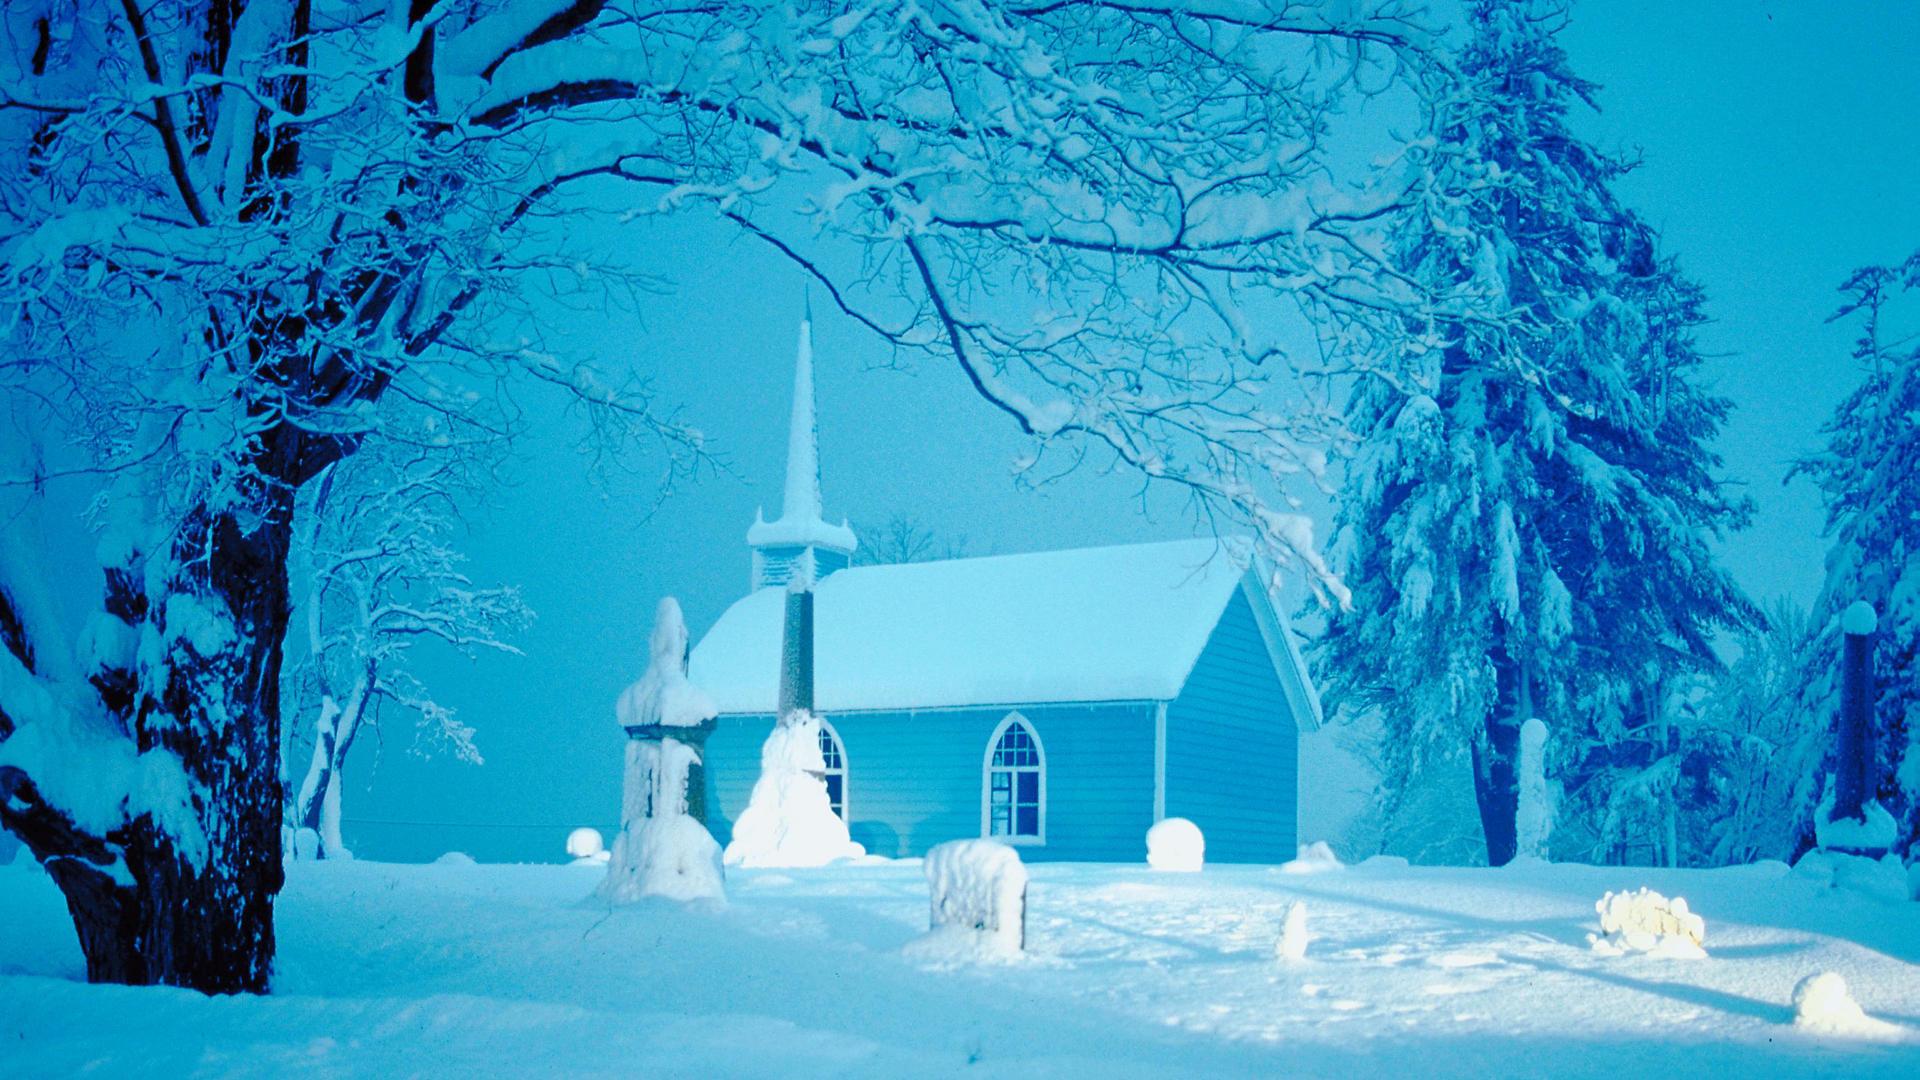 Beautiful Winter Landscapes Amazing Scenery Pinterest   HD Wallpapers    Pinterest   Snow scenes, Wallpaper and Winter landscape